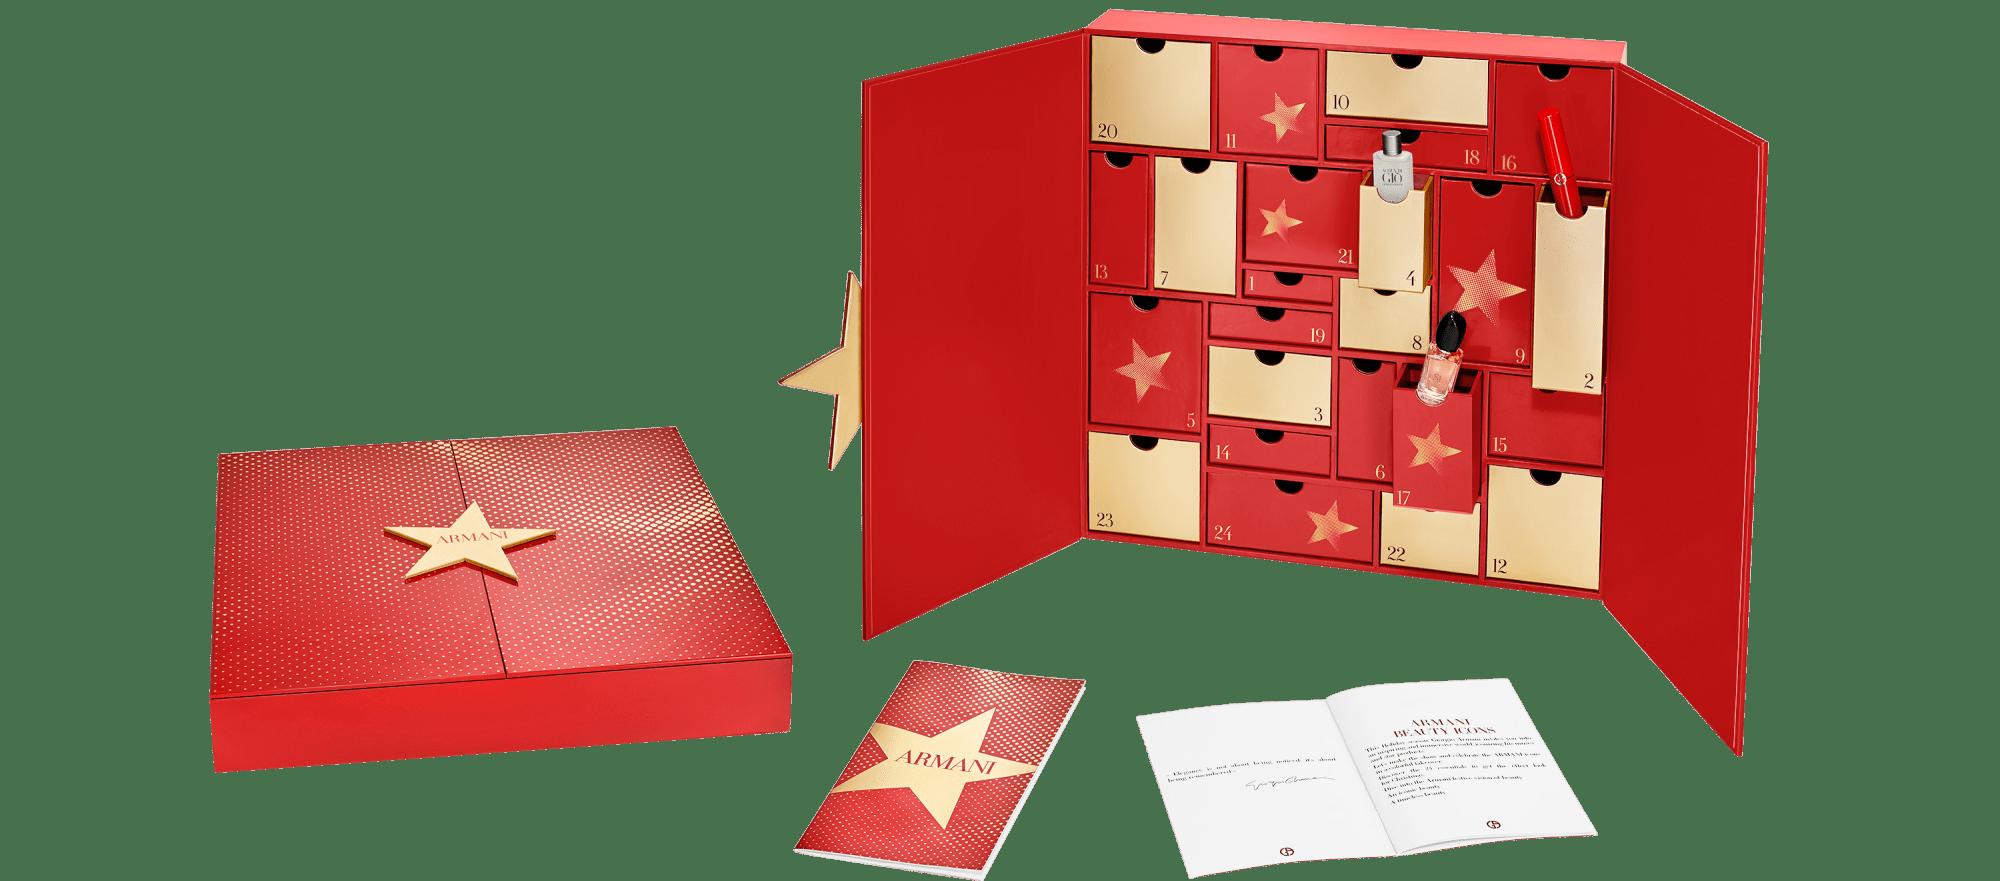 ARMANI BEAUTY advent calendar 2019